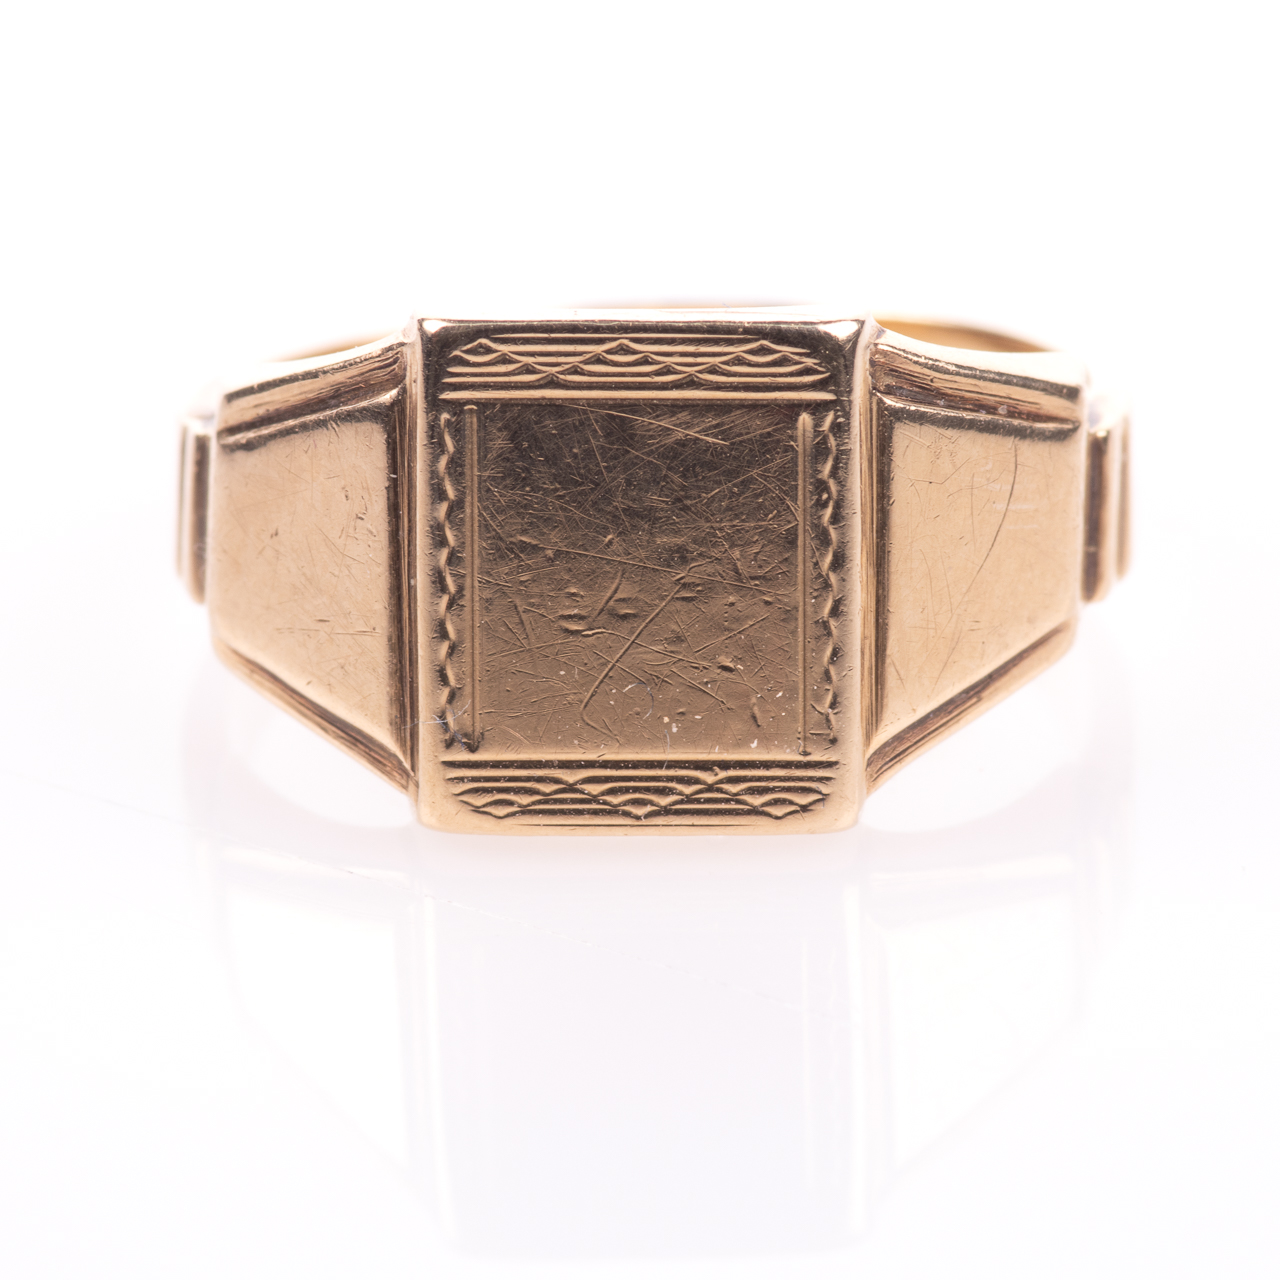 Art Deco Style Gentleman's Signet Ring 9ct Gold - Image 3 of 7